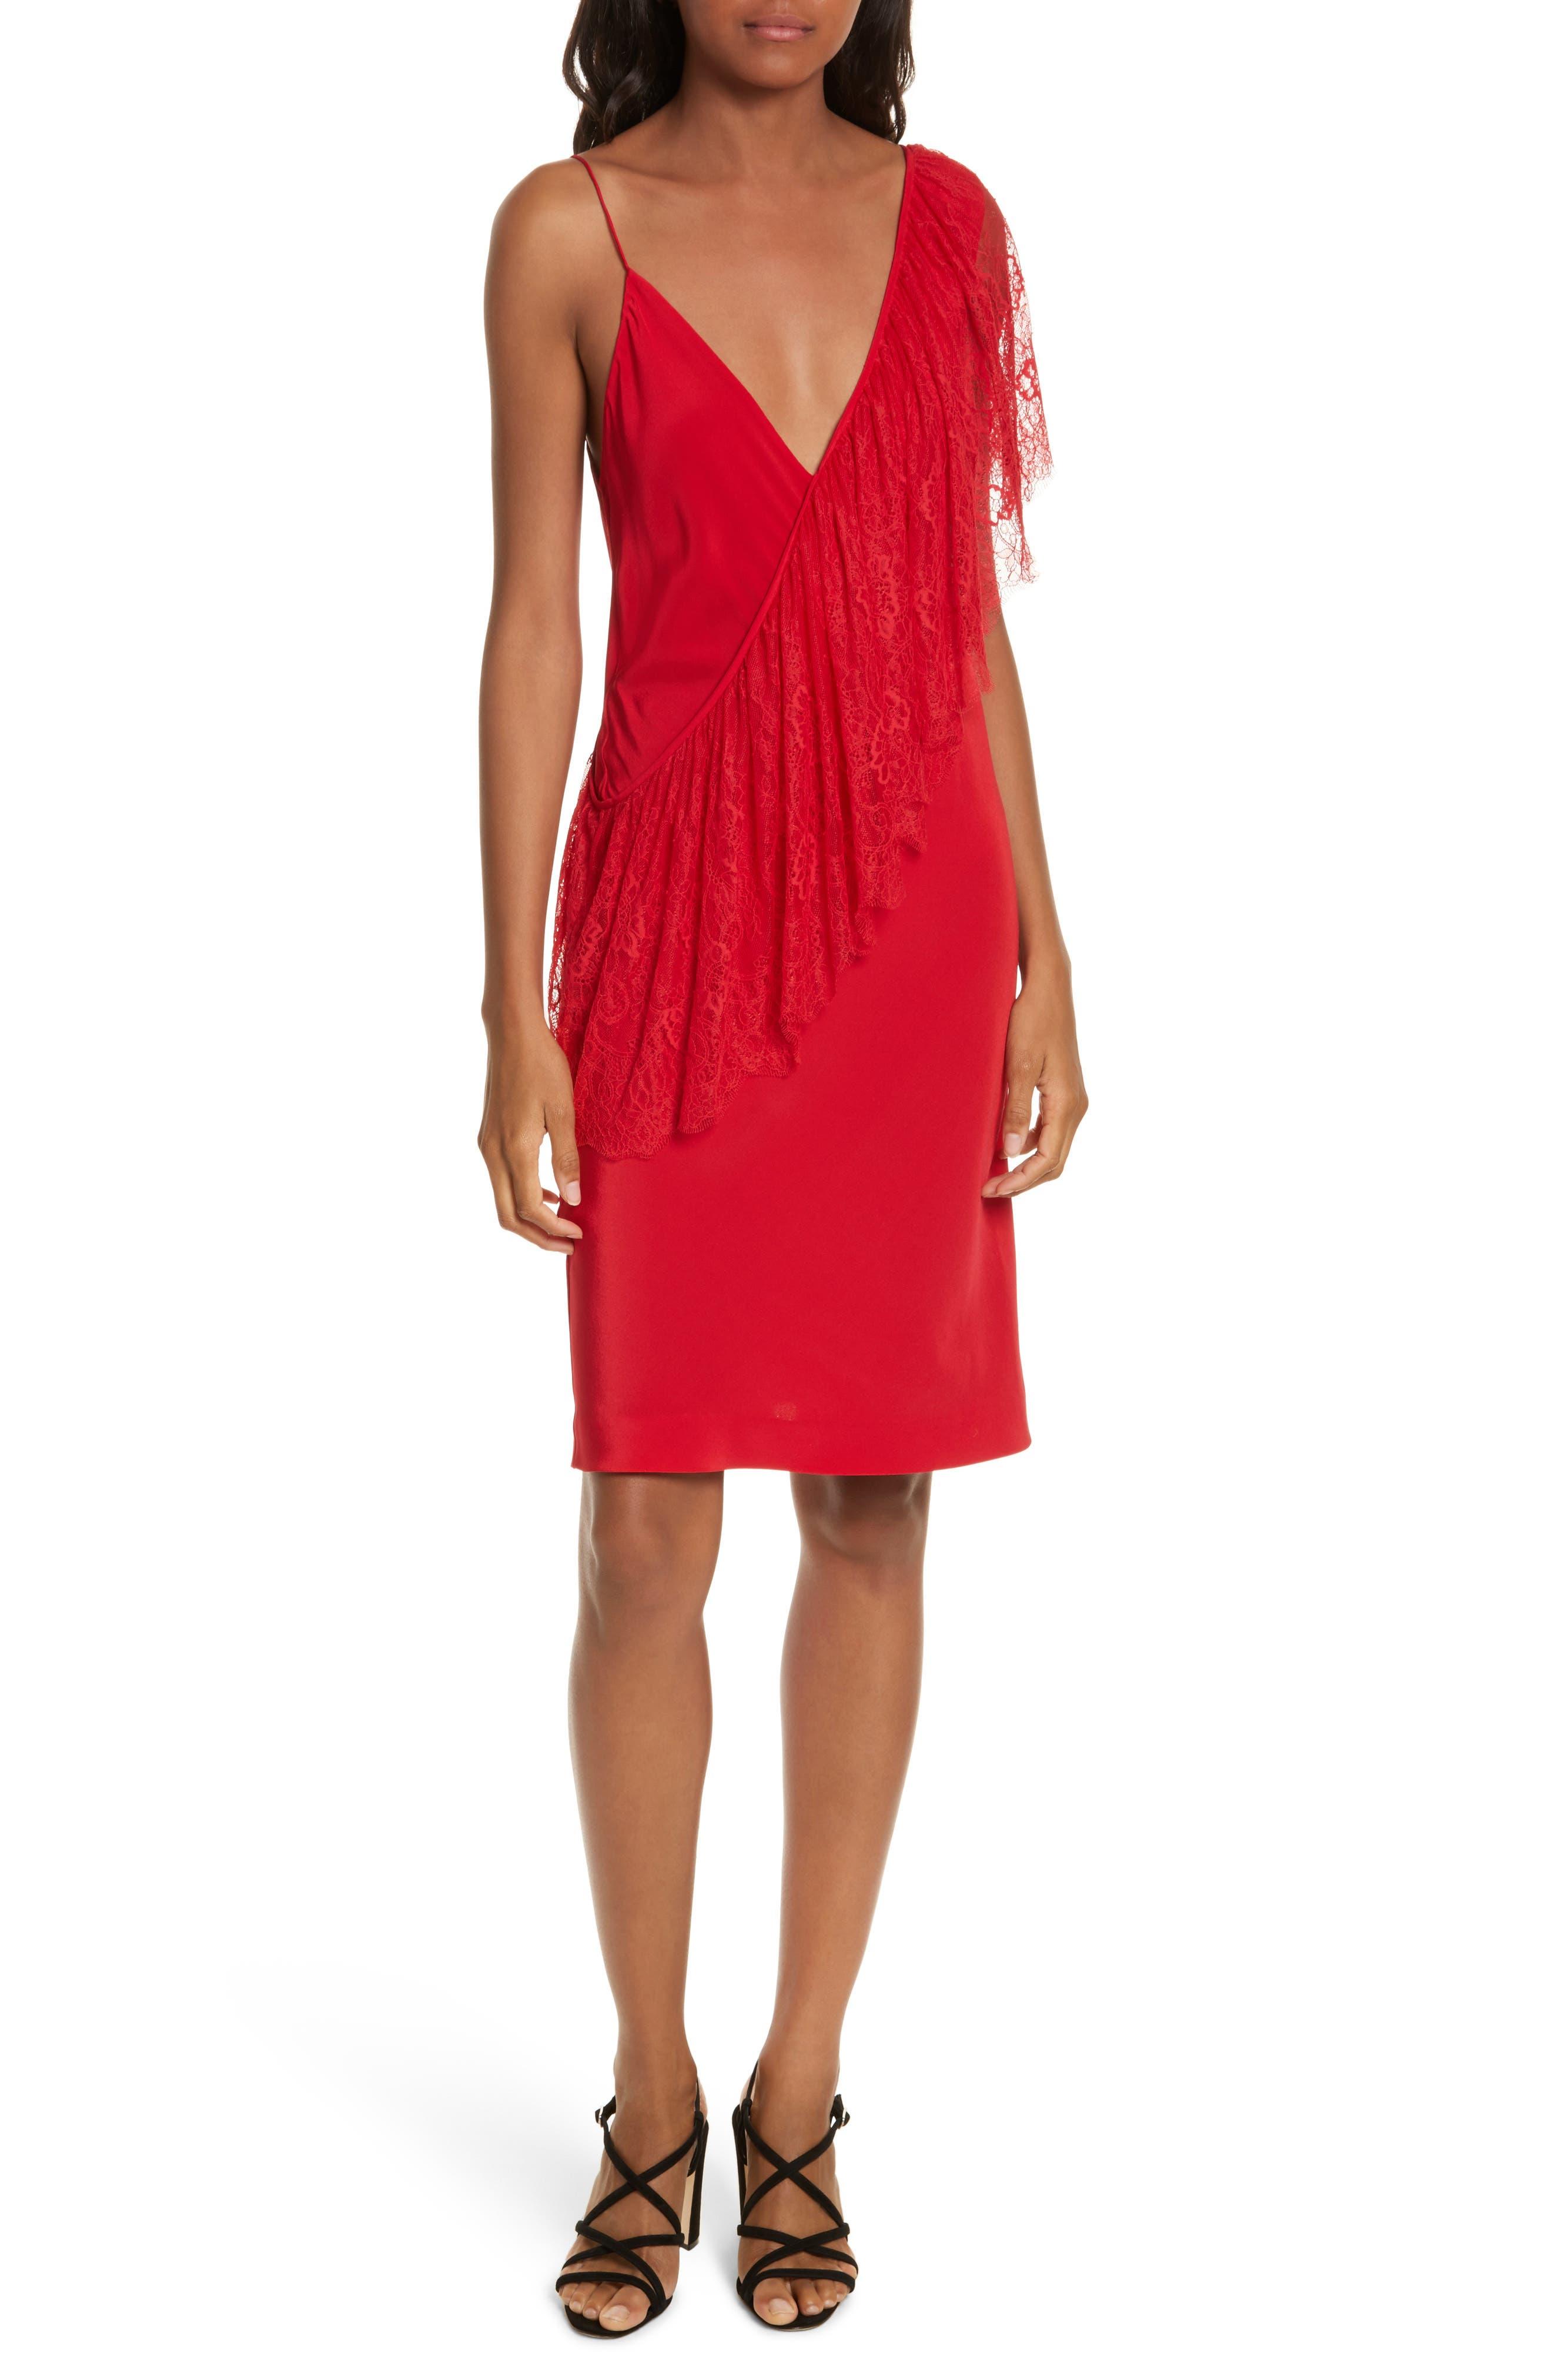 Alternate Image 1 Selected - Diane von Furstenberg Ruffle Front Lace Dress